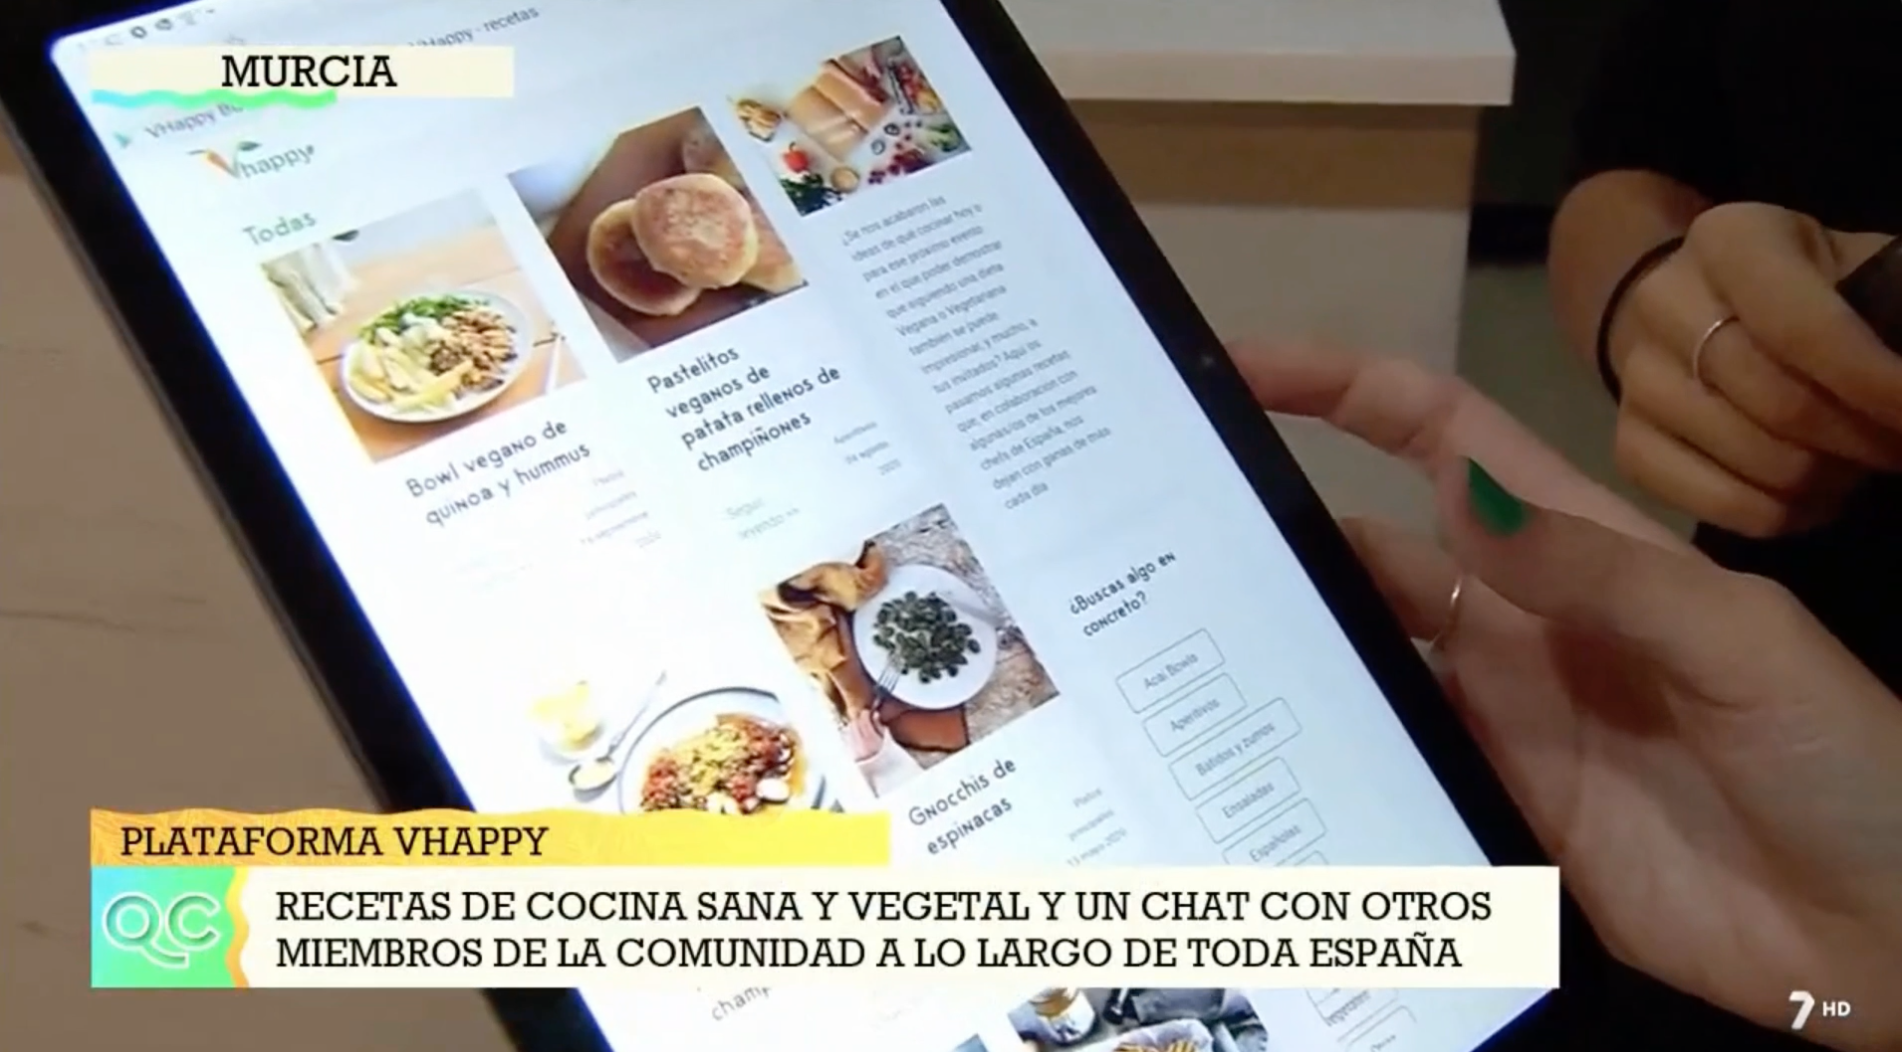 VHappy: App para encontrar restaurantes veganos en toda España